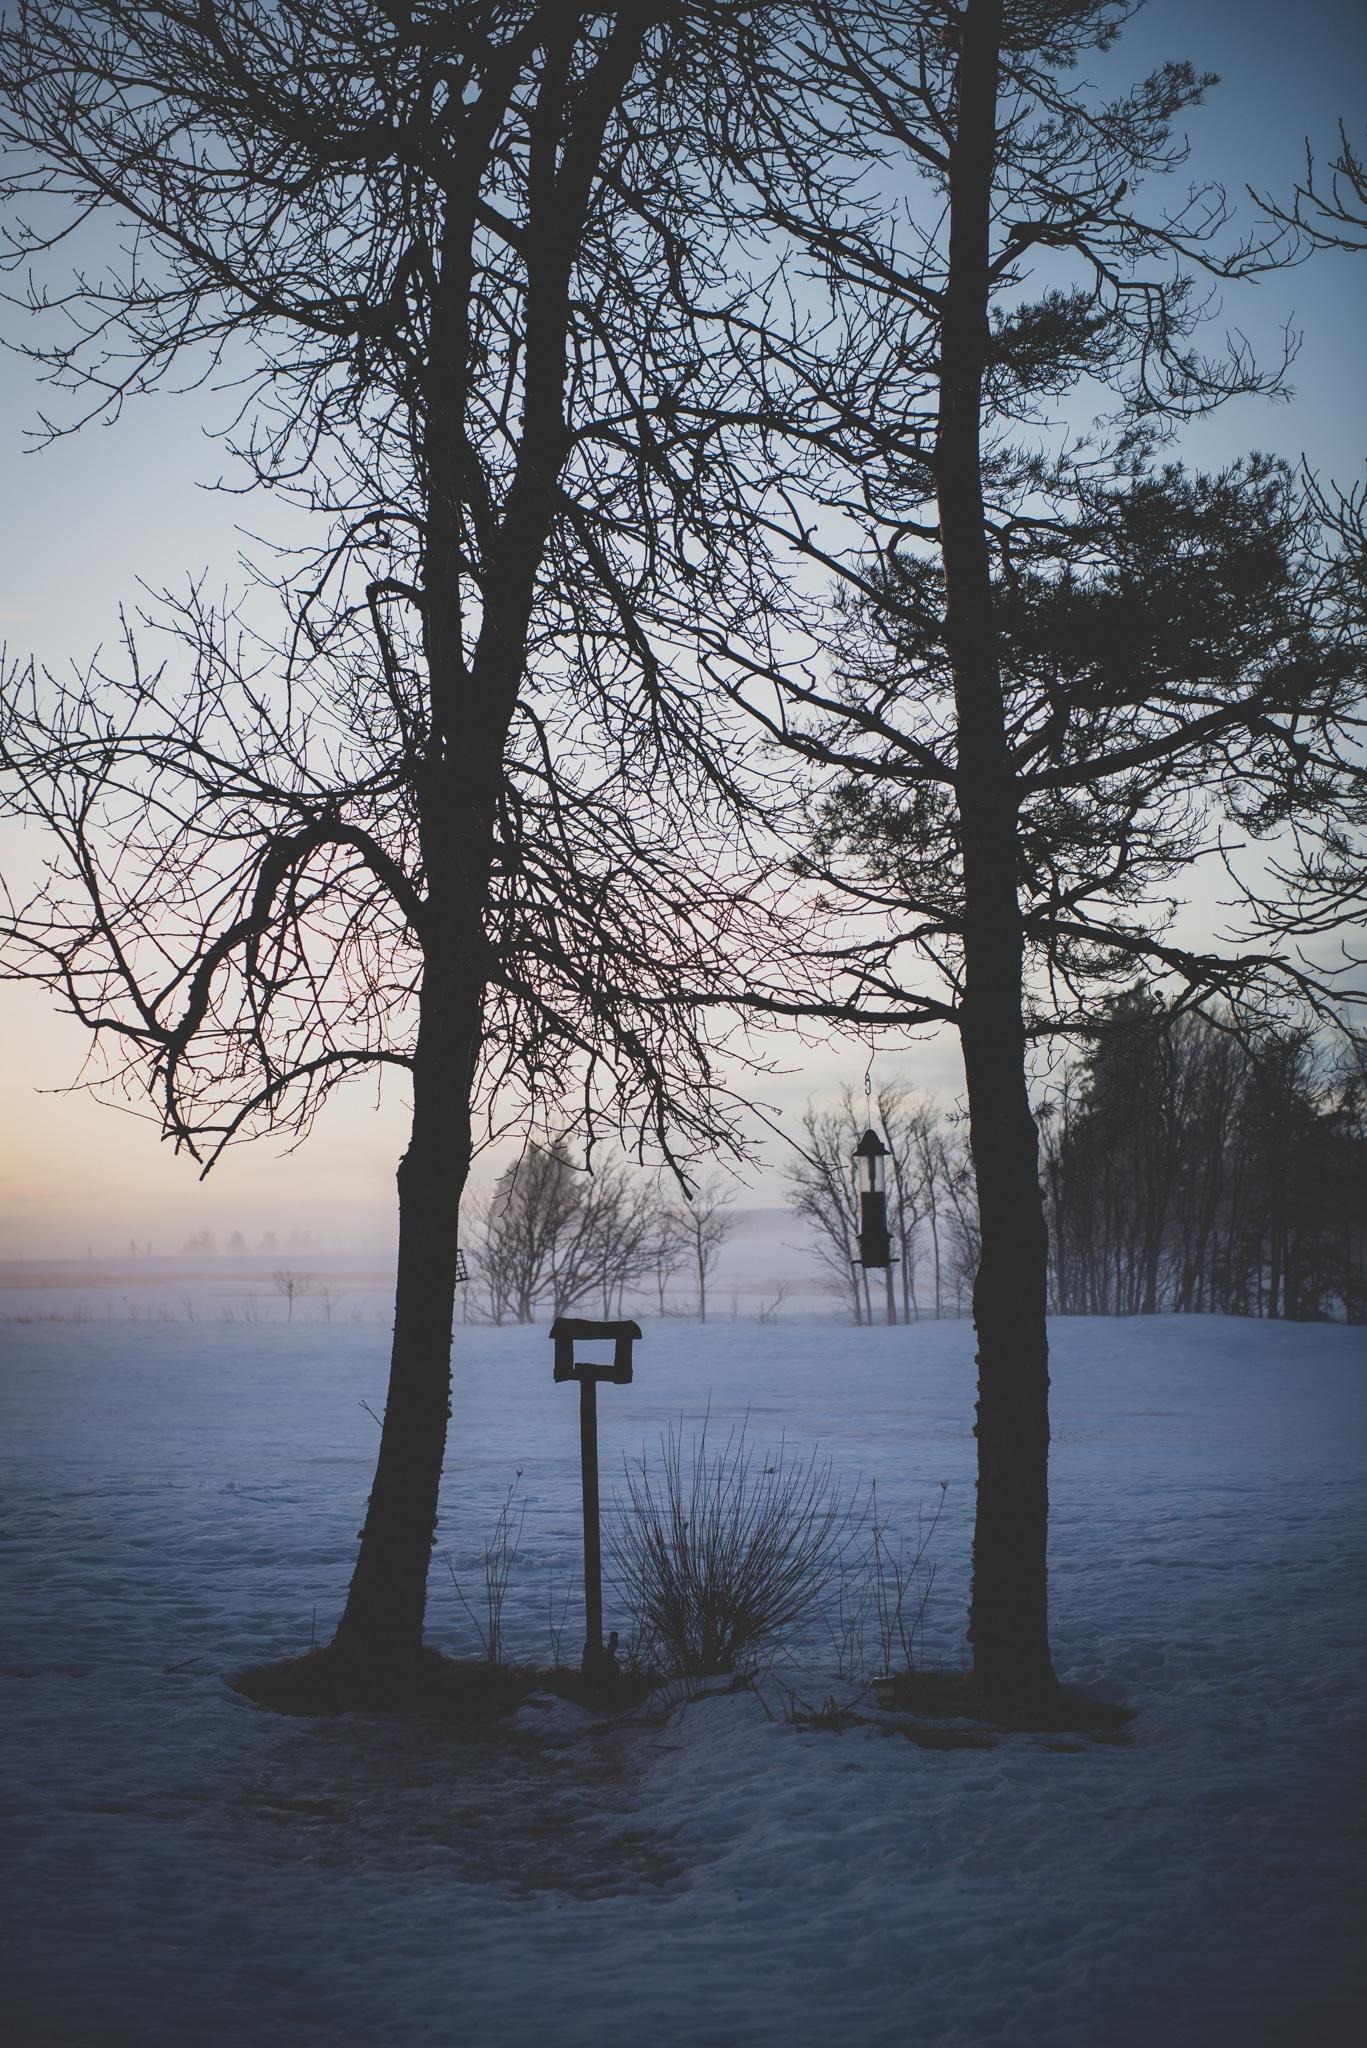 foggy trees with bird feeders